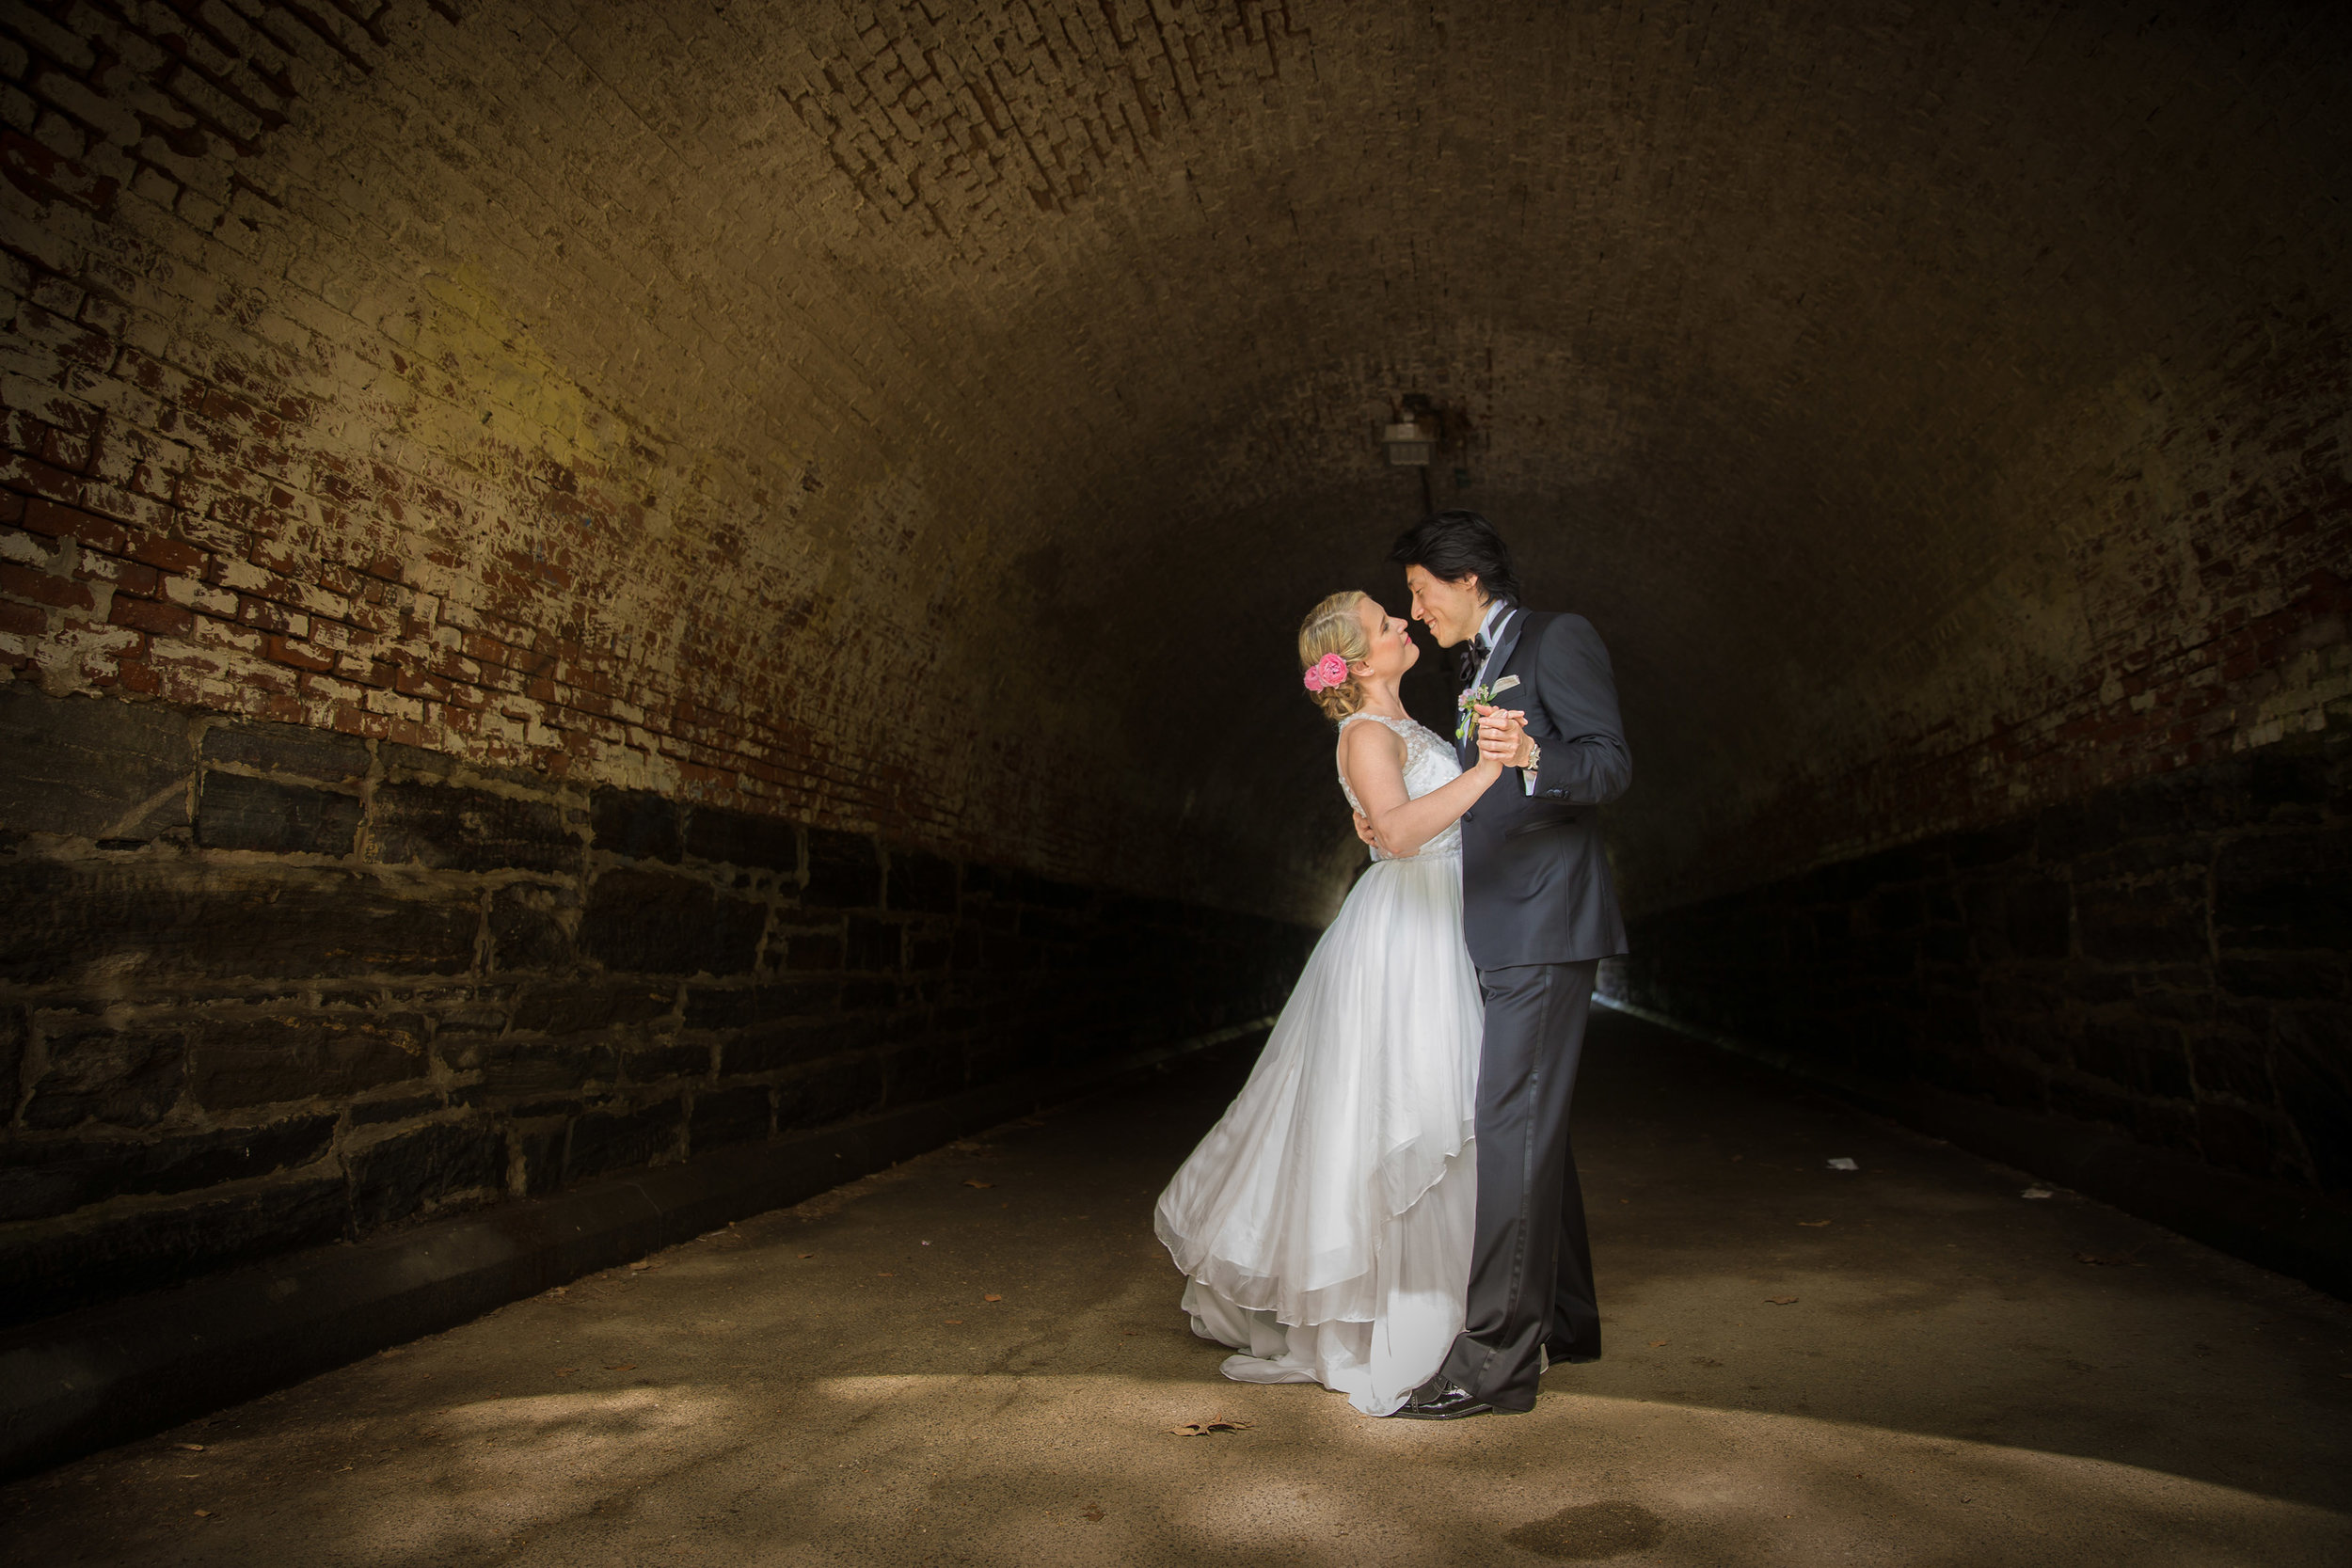 victorious-events-nyc-011-colleen-taka-central-park-zoo-wedding-raymond-hamlin.jpg